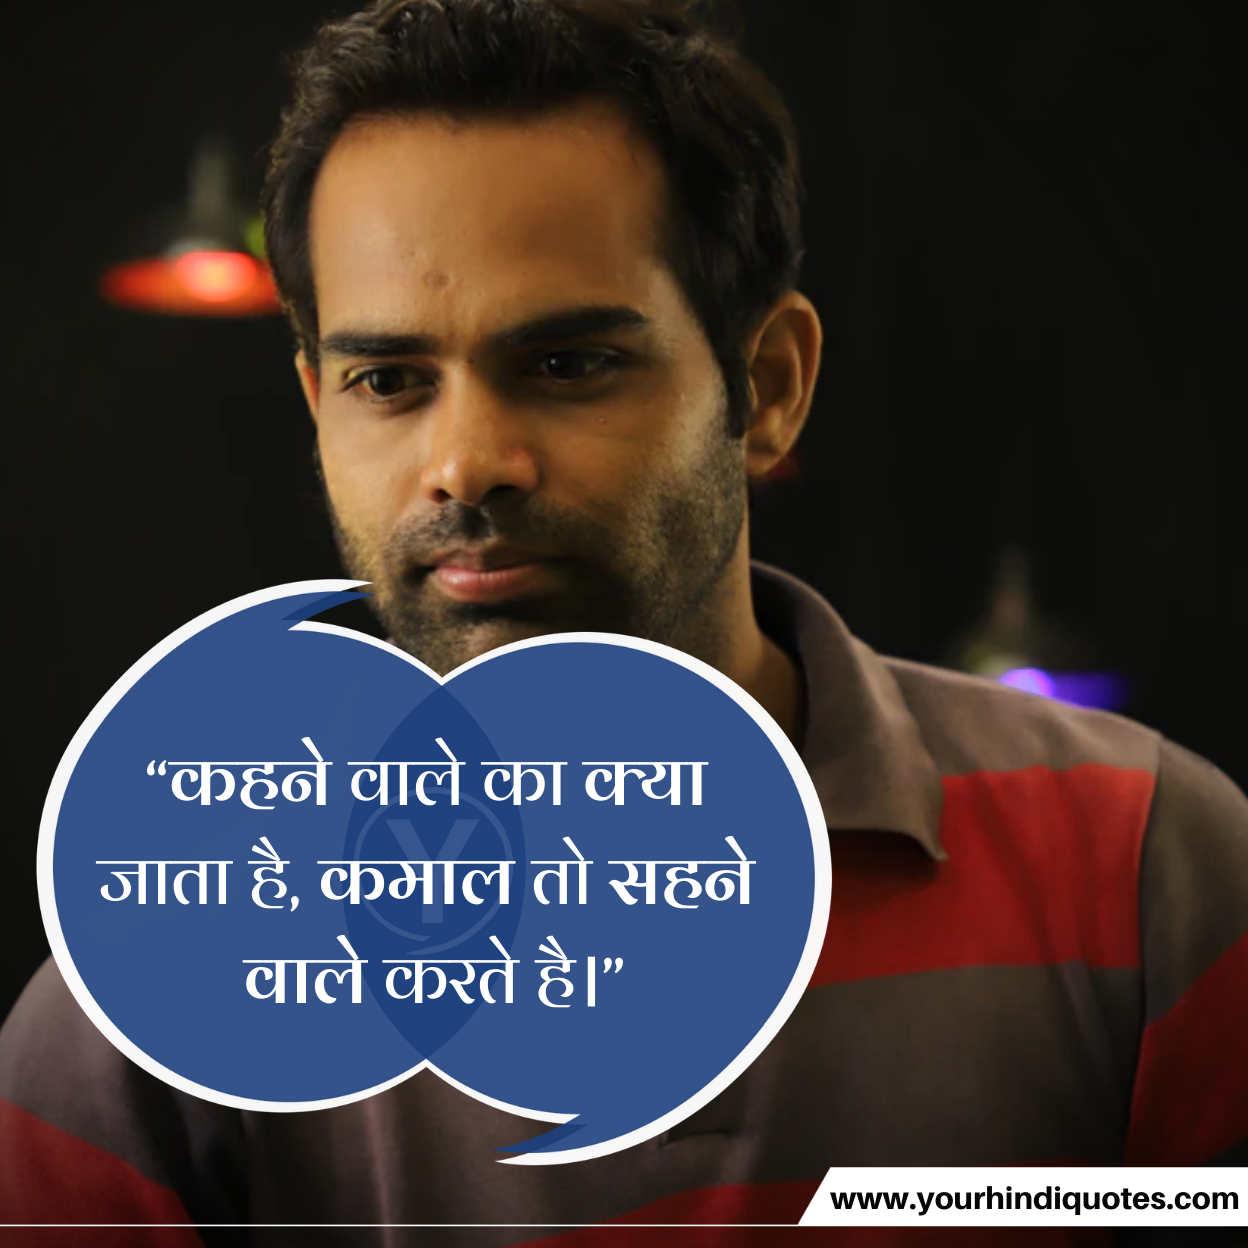 Hindi Best Life Quotes Photos